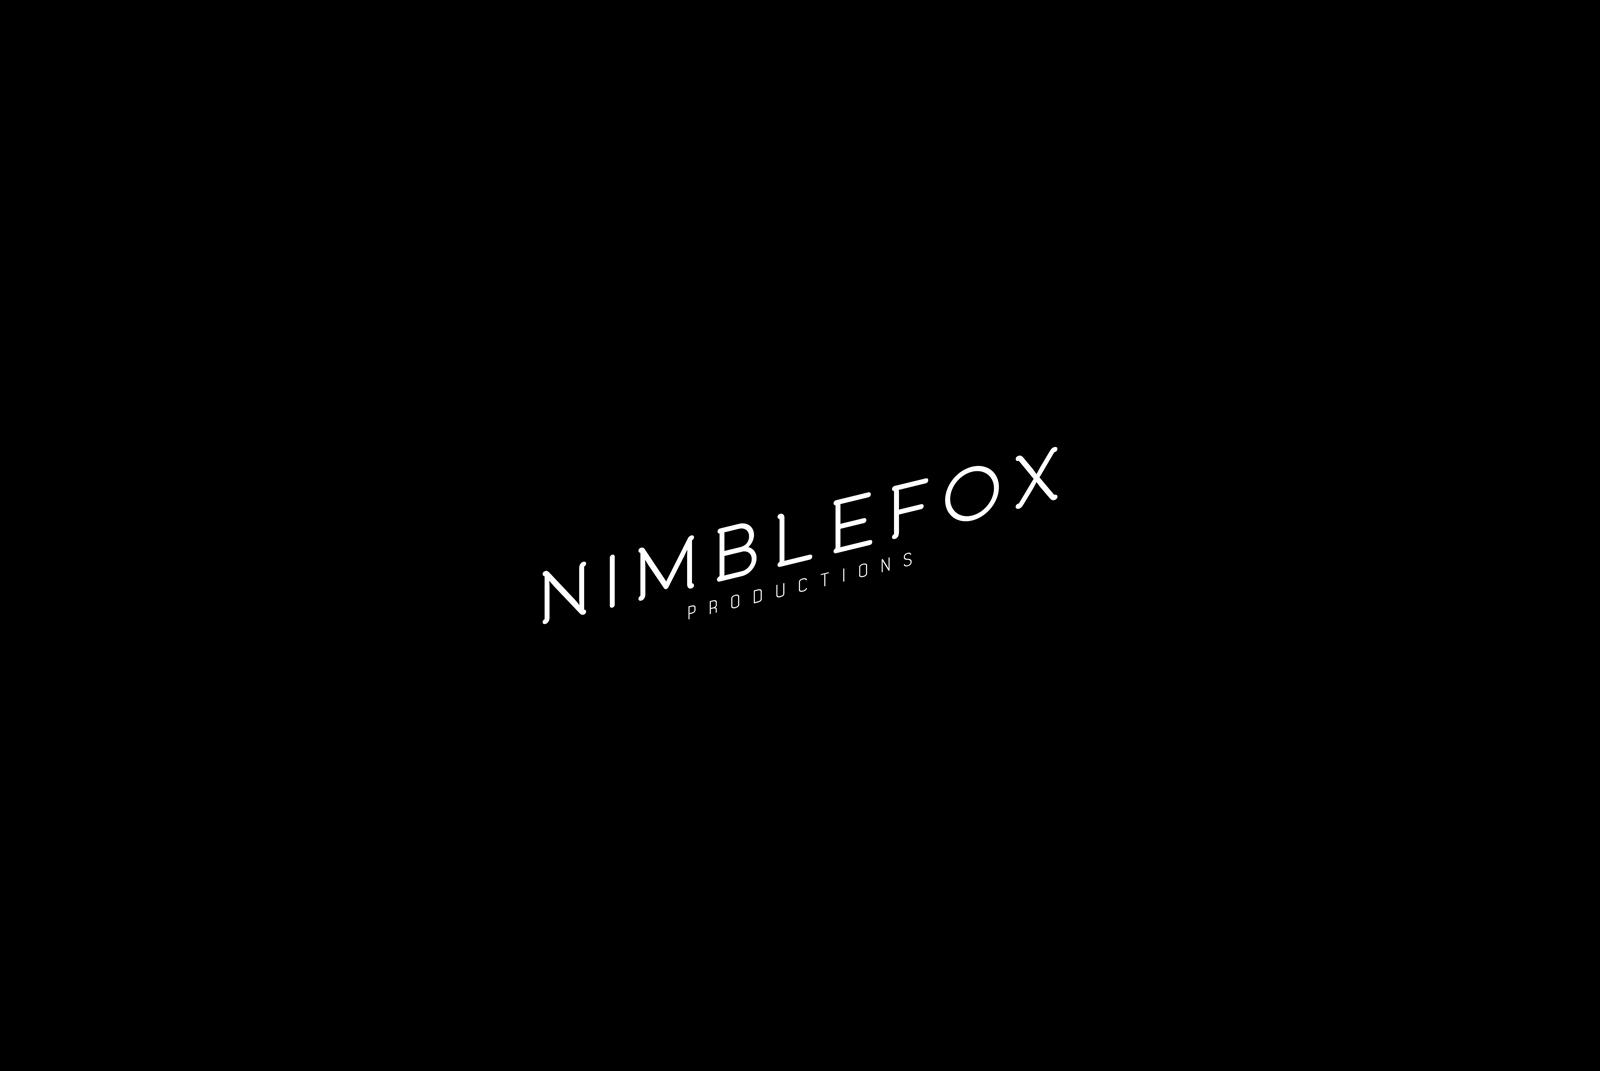 nimblefox_11